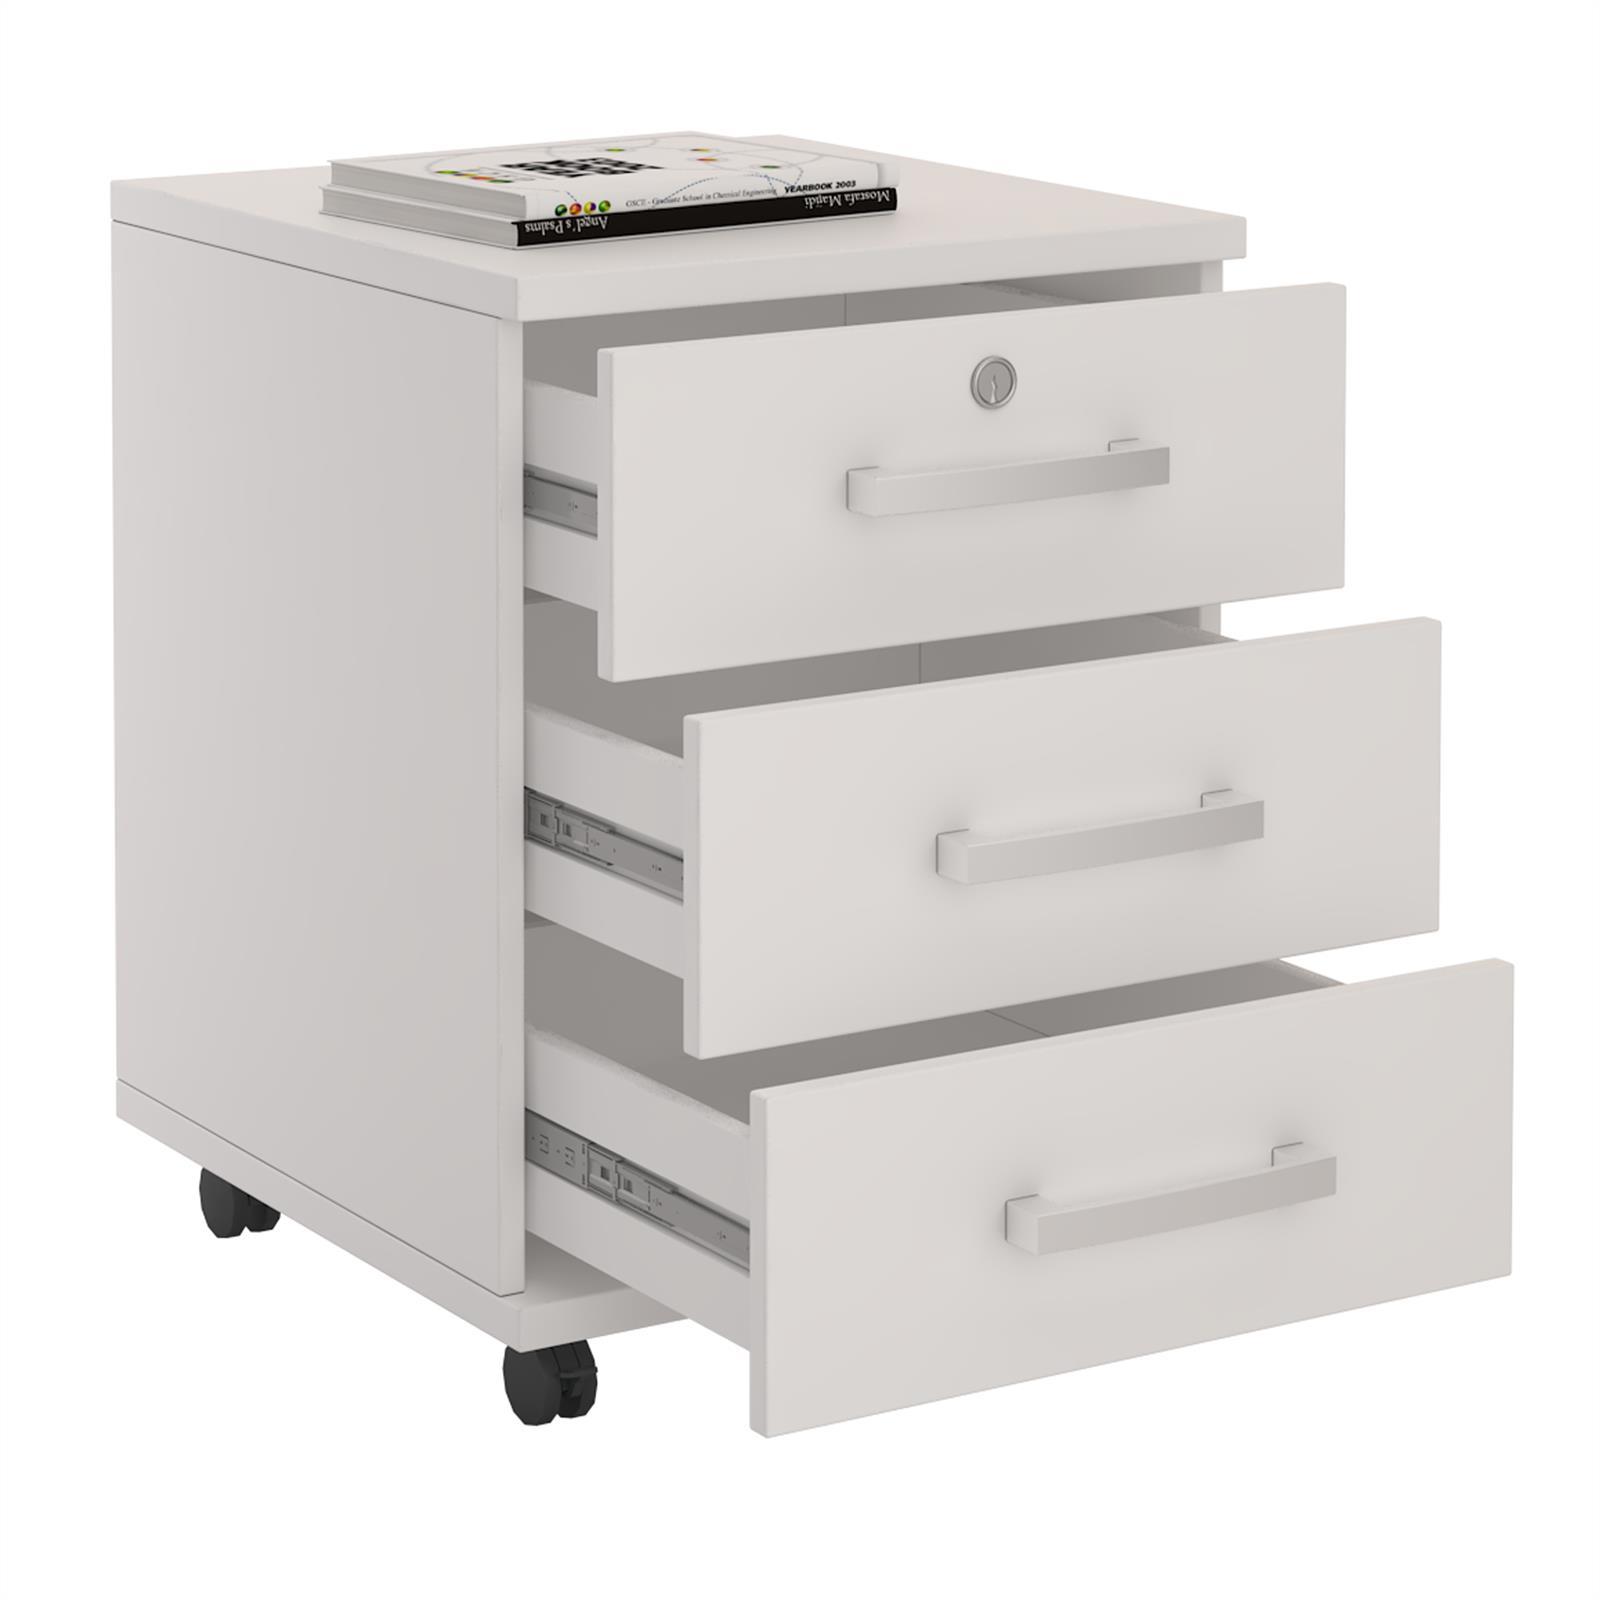 rollcontainer vancouver in wei mit 3 schubladen caro m bel. Black Bedroom Furniture Sets. Home Design Ideas